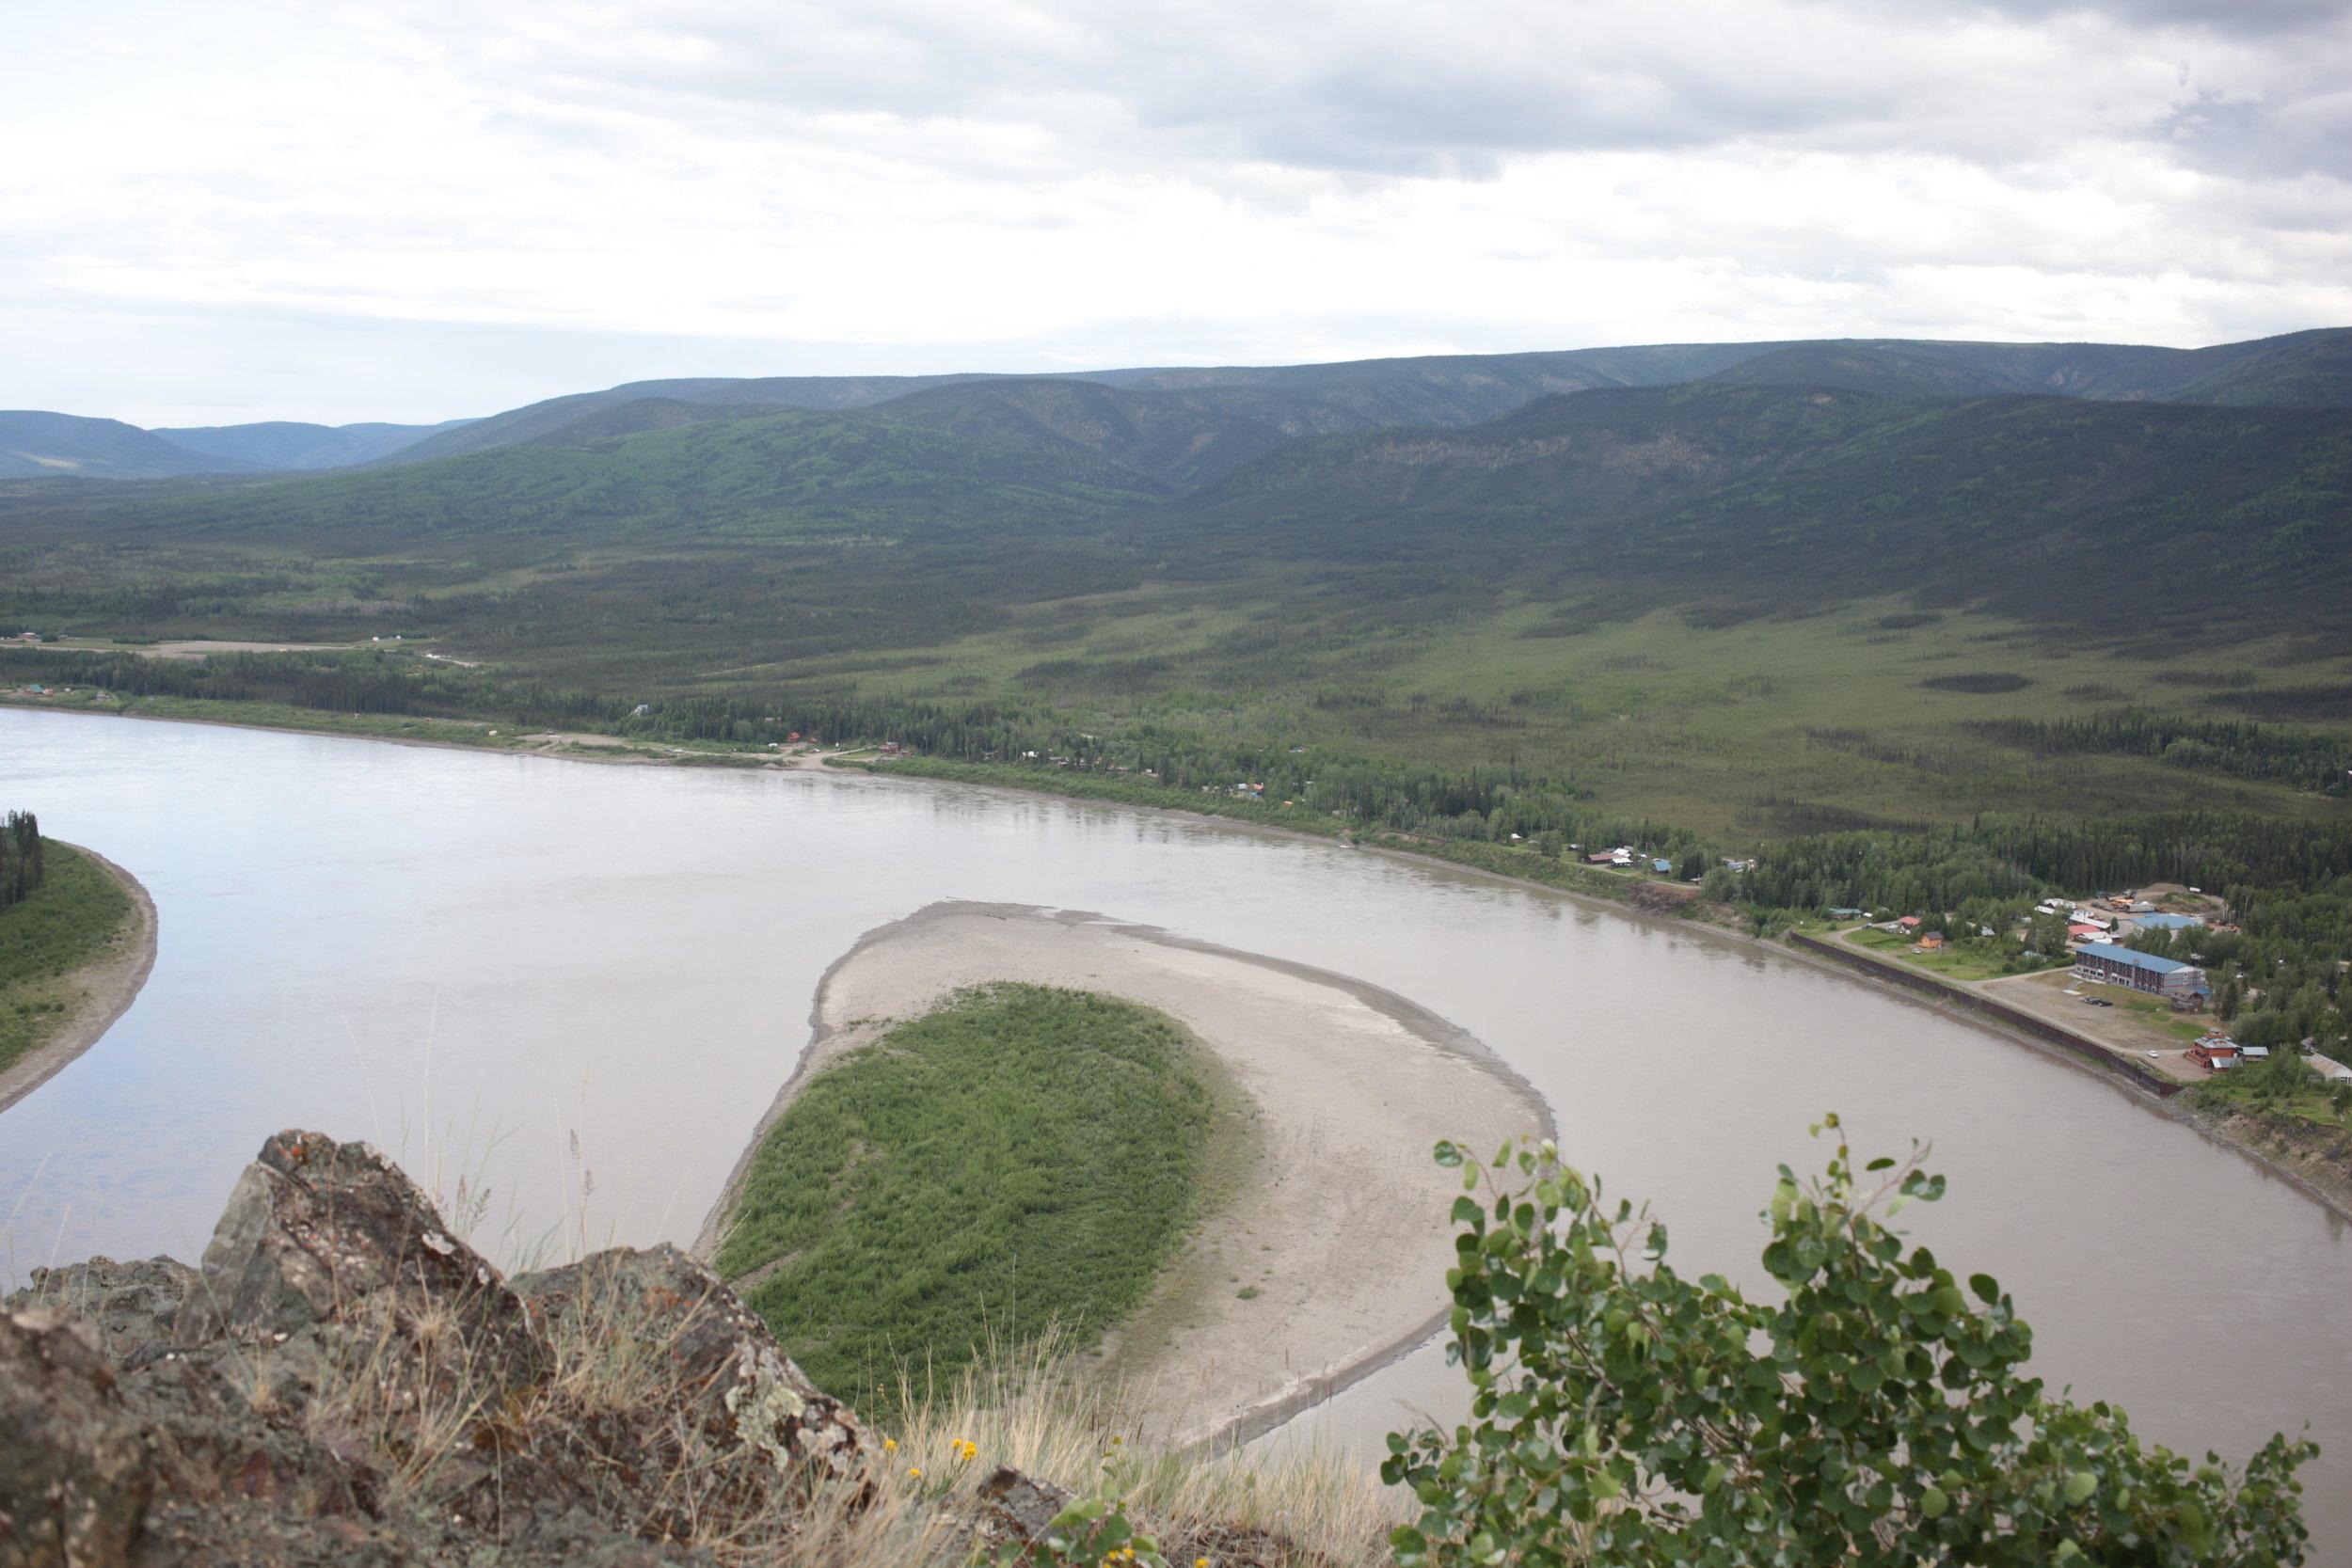 The Eagle community along the Yukon River.